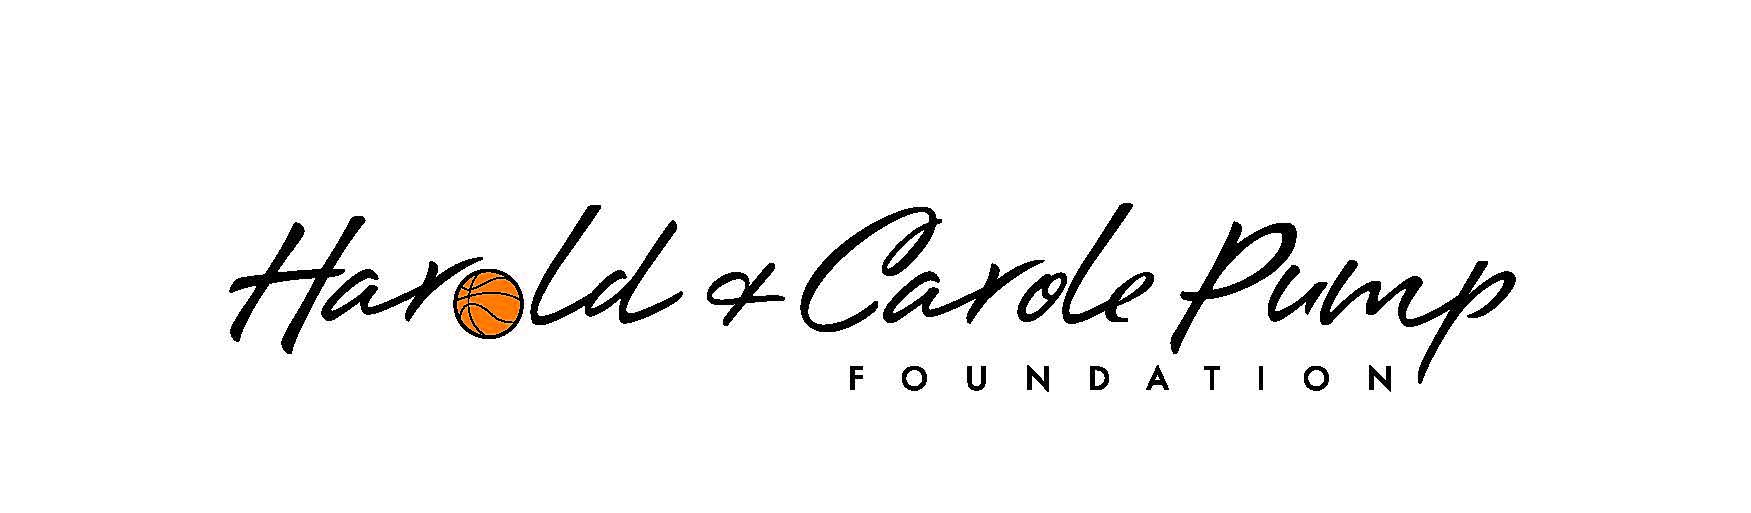 Harold and Carole Pump Foundation